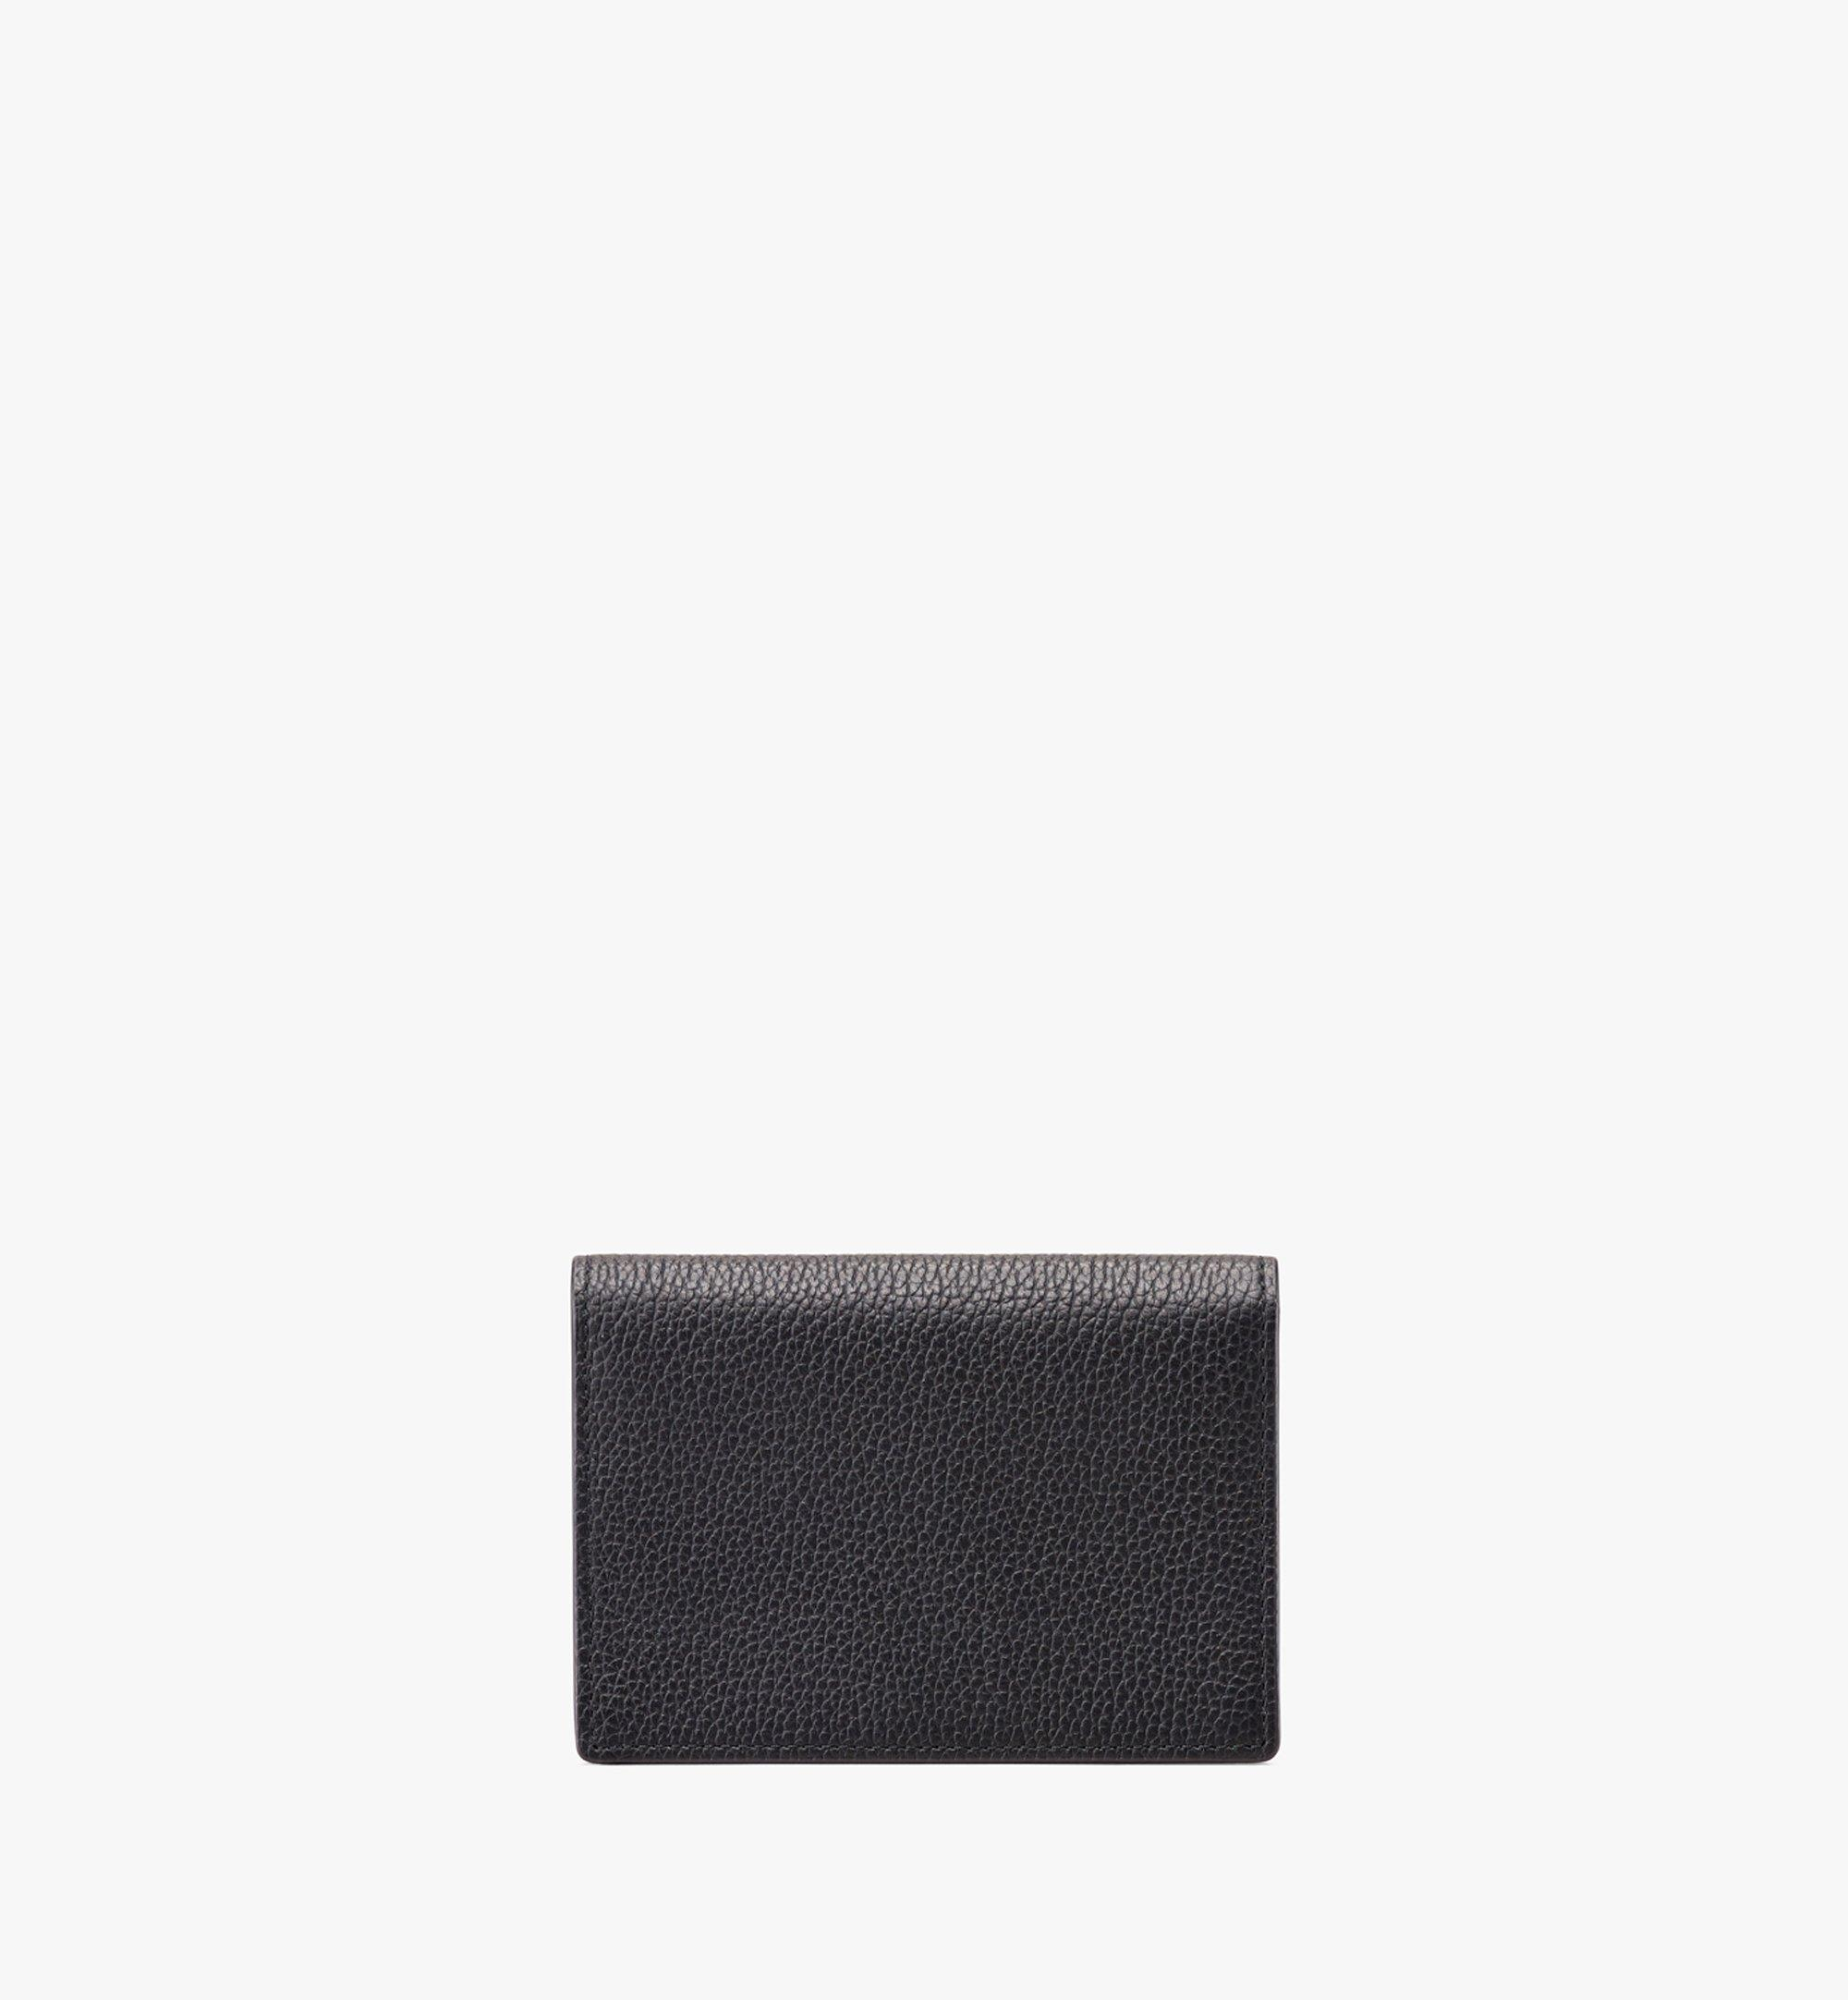 MCM Love Letter Wallet in Colorblock Visetos Black MYS9ALV03CB001 Alternate View 1